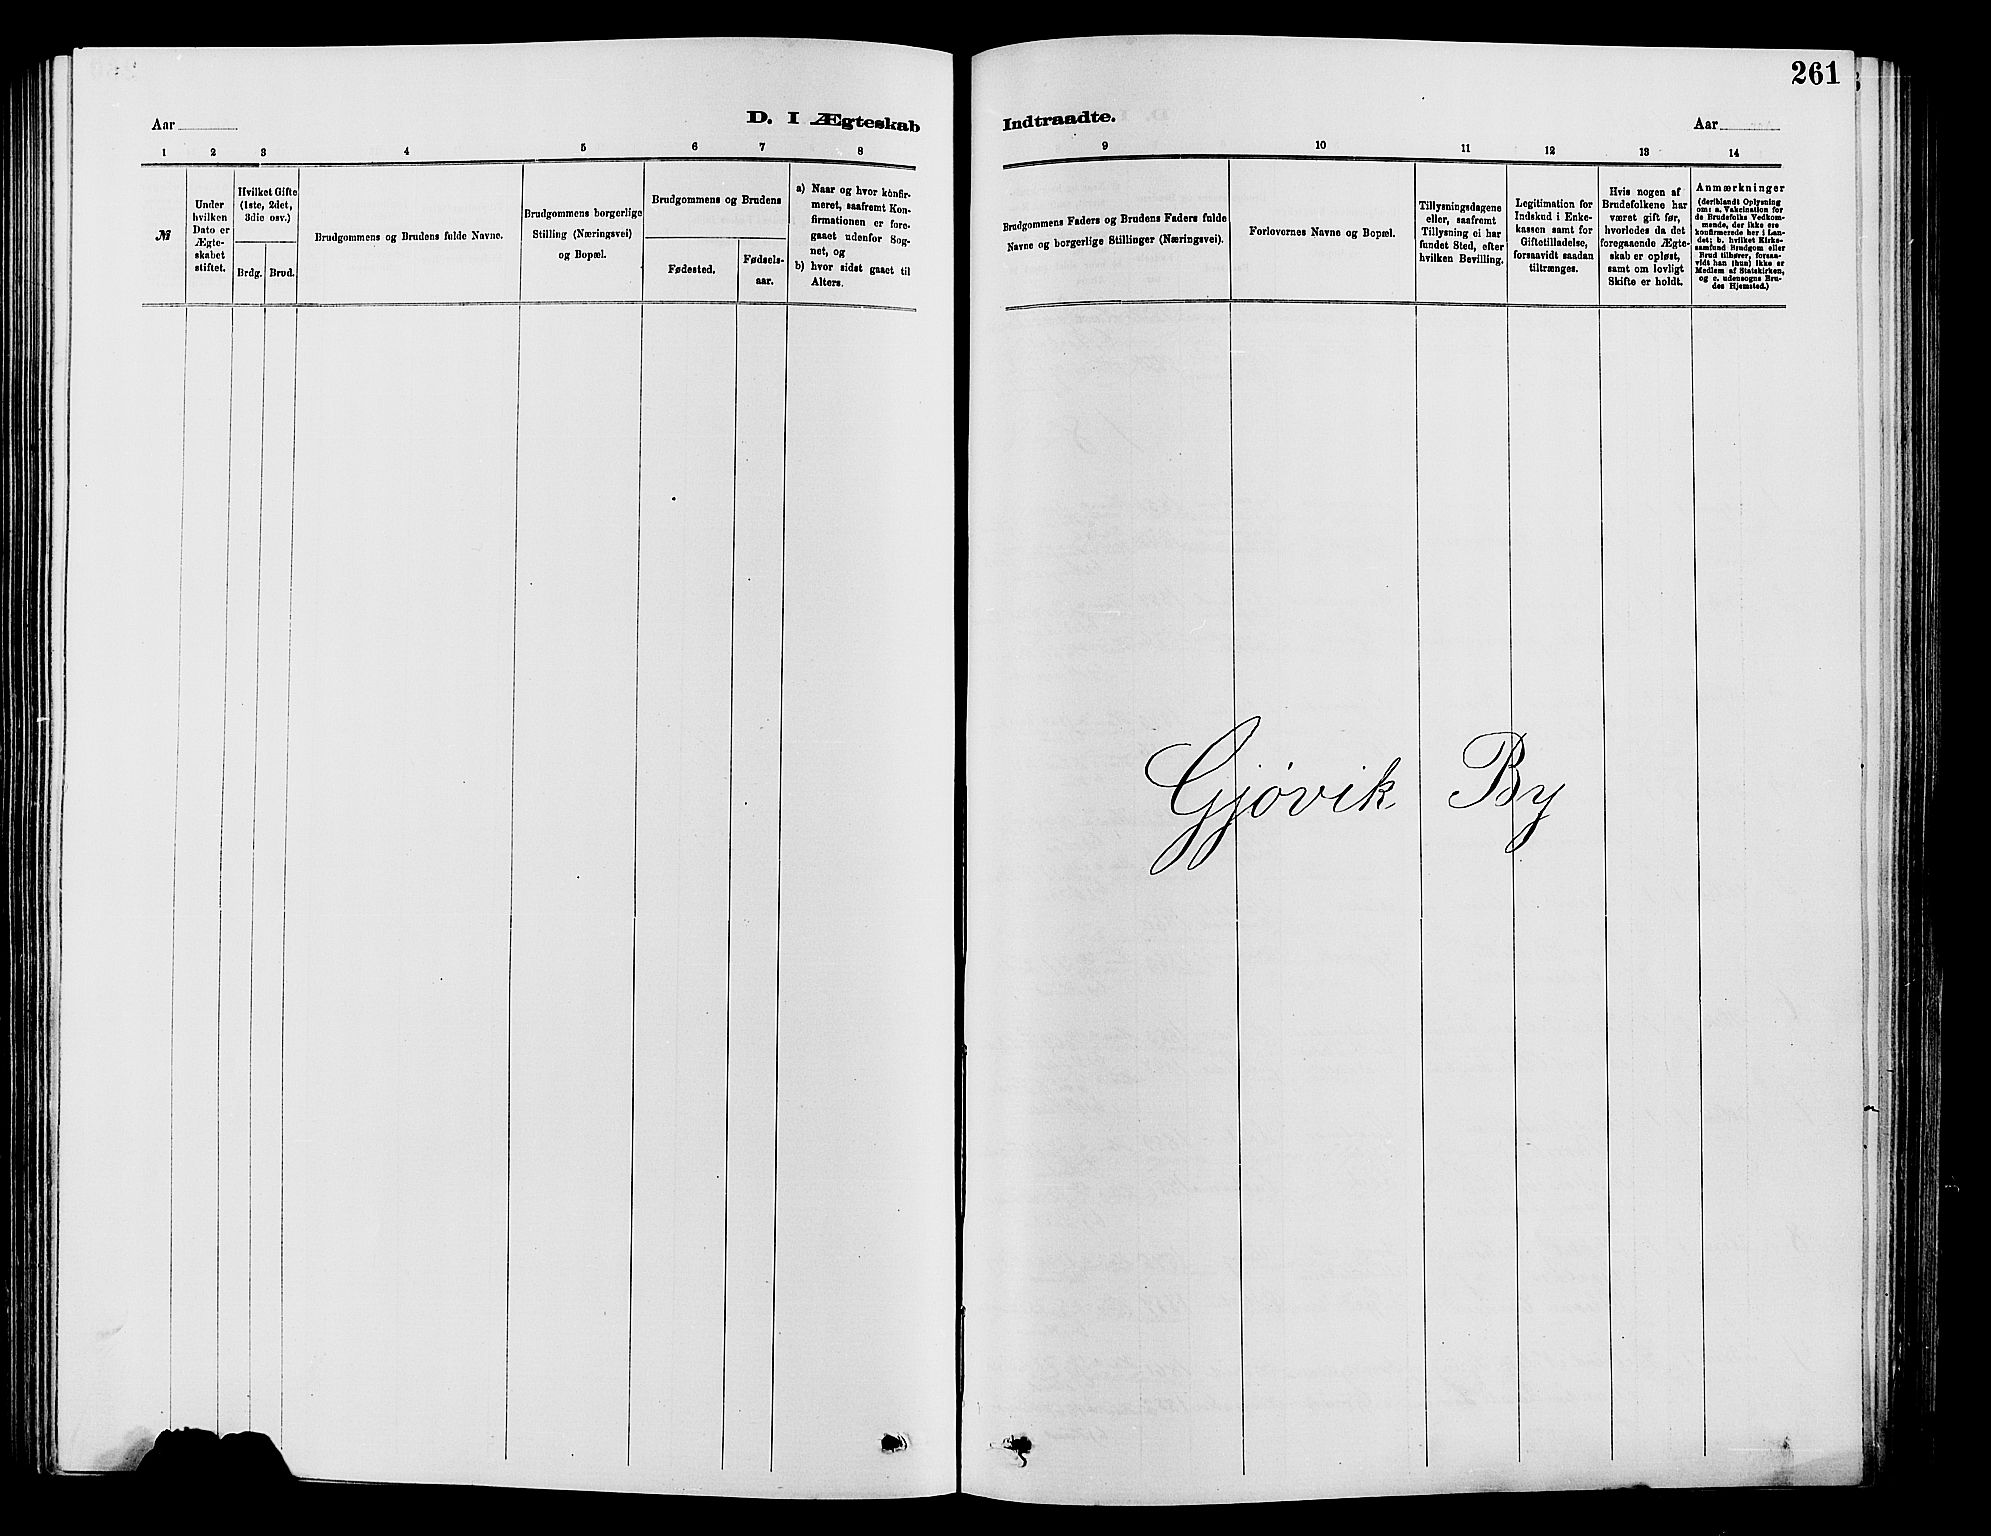 SAH, Vardal prestekontor, H/Ha/Hab/L0007: Klokkerbok nr. 7 /2, 1881-1895, s. 261